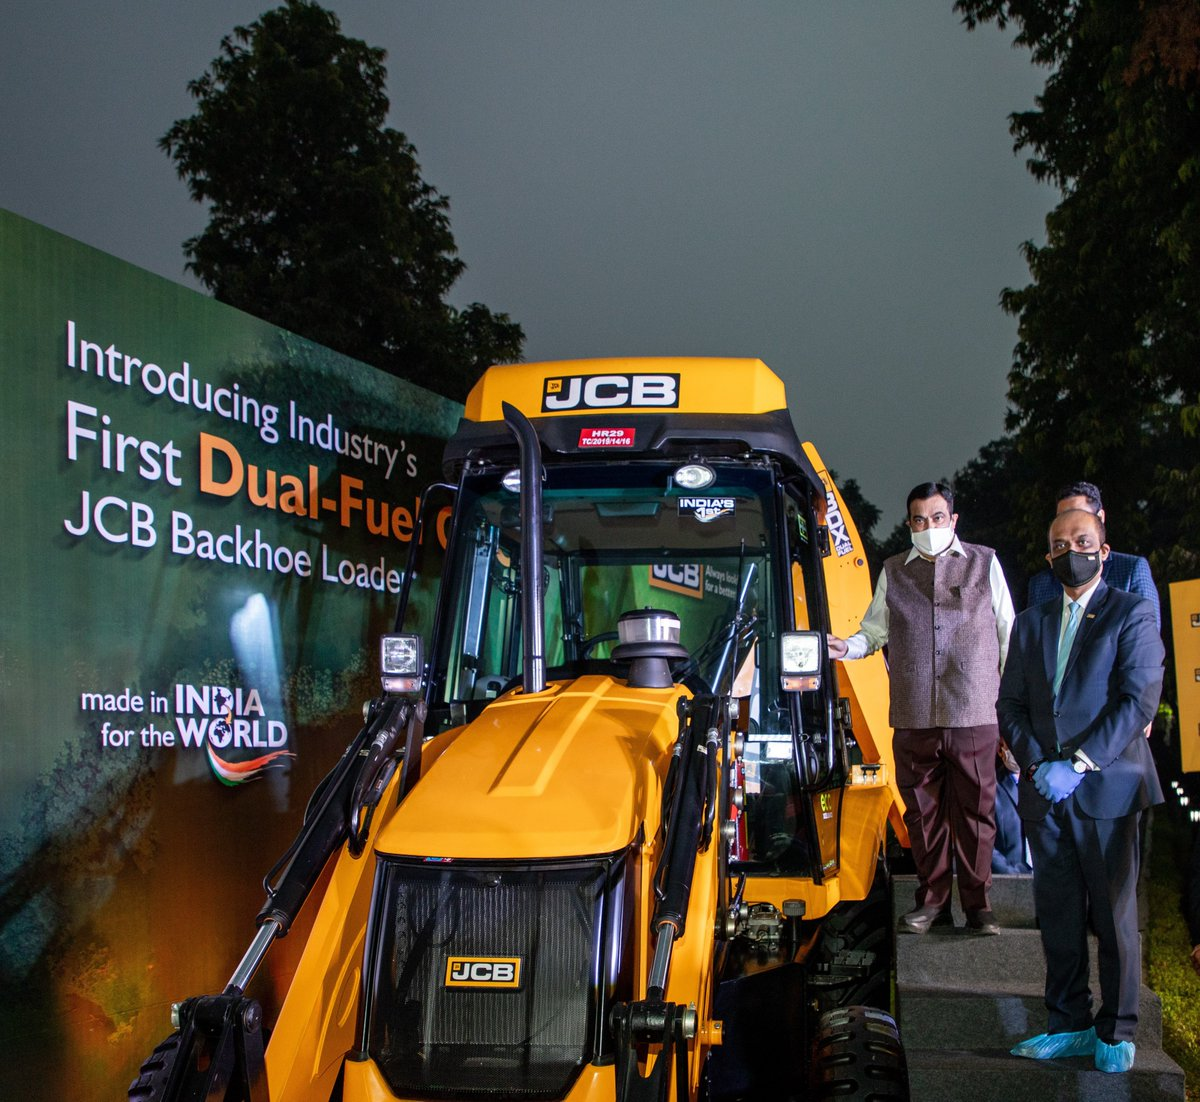 Our #MadeInIndia dual-fuel CNG Backhoe Loader is a significant step towards a planet-positive future.  #AatmaNirbharBharat #TransformingIndia #MakeInIndia #Innovation #JCBIndia  @nitin_gadkari @Deepak_Shetty09 @MORTHIndia @NHAI_Official @minmsme @OfficeOfNG